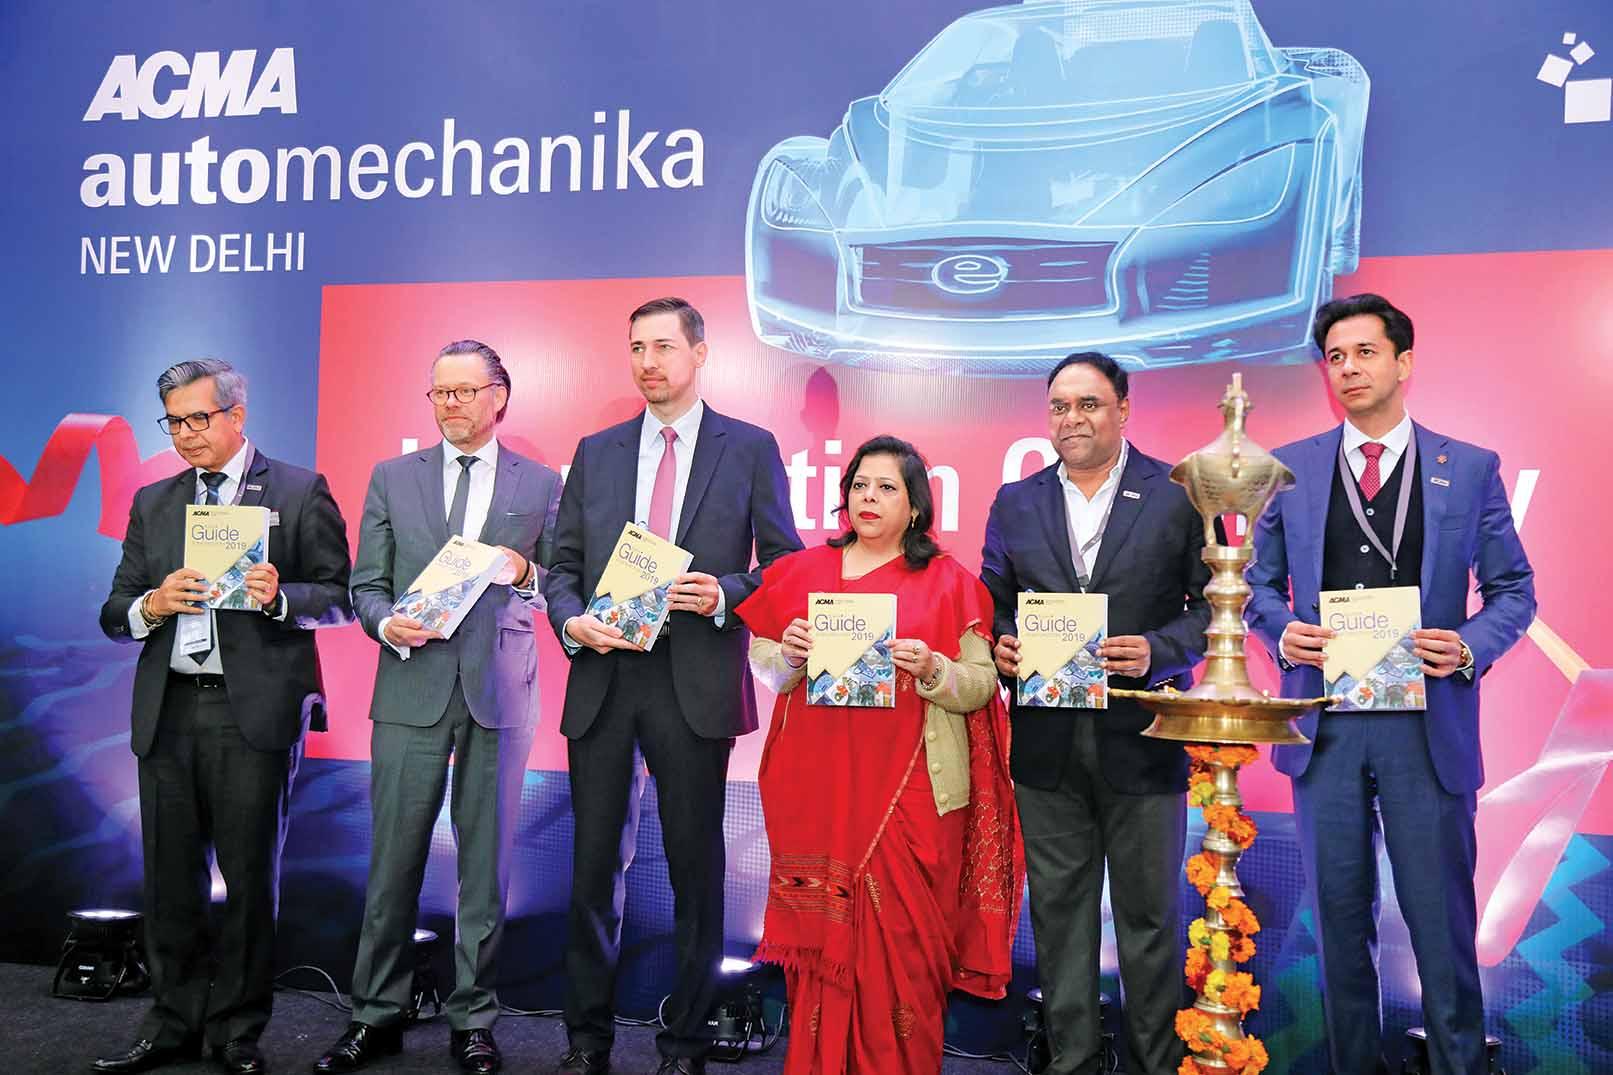 Acma Automechanika New Delhi 2019 Gives Big Boost To Indian